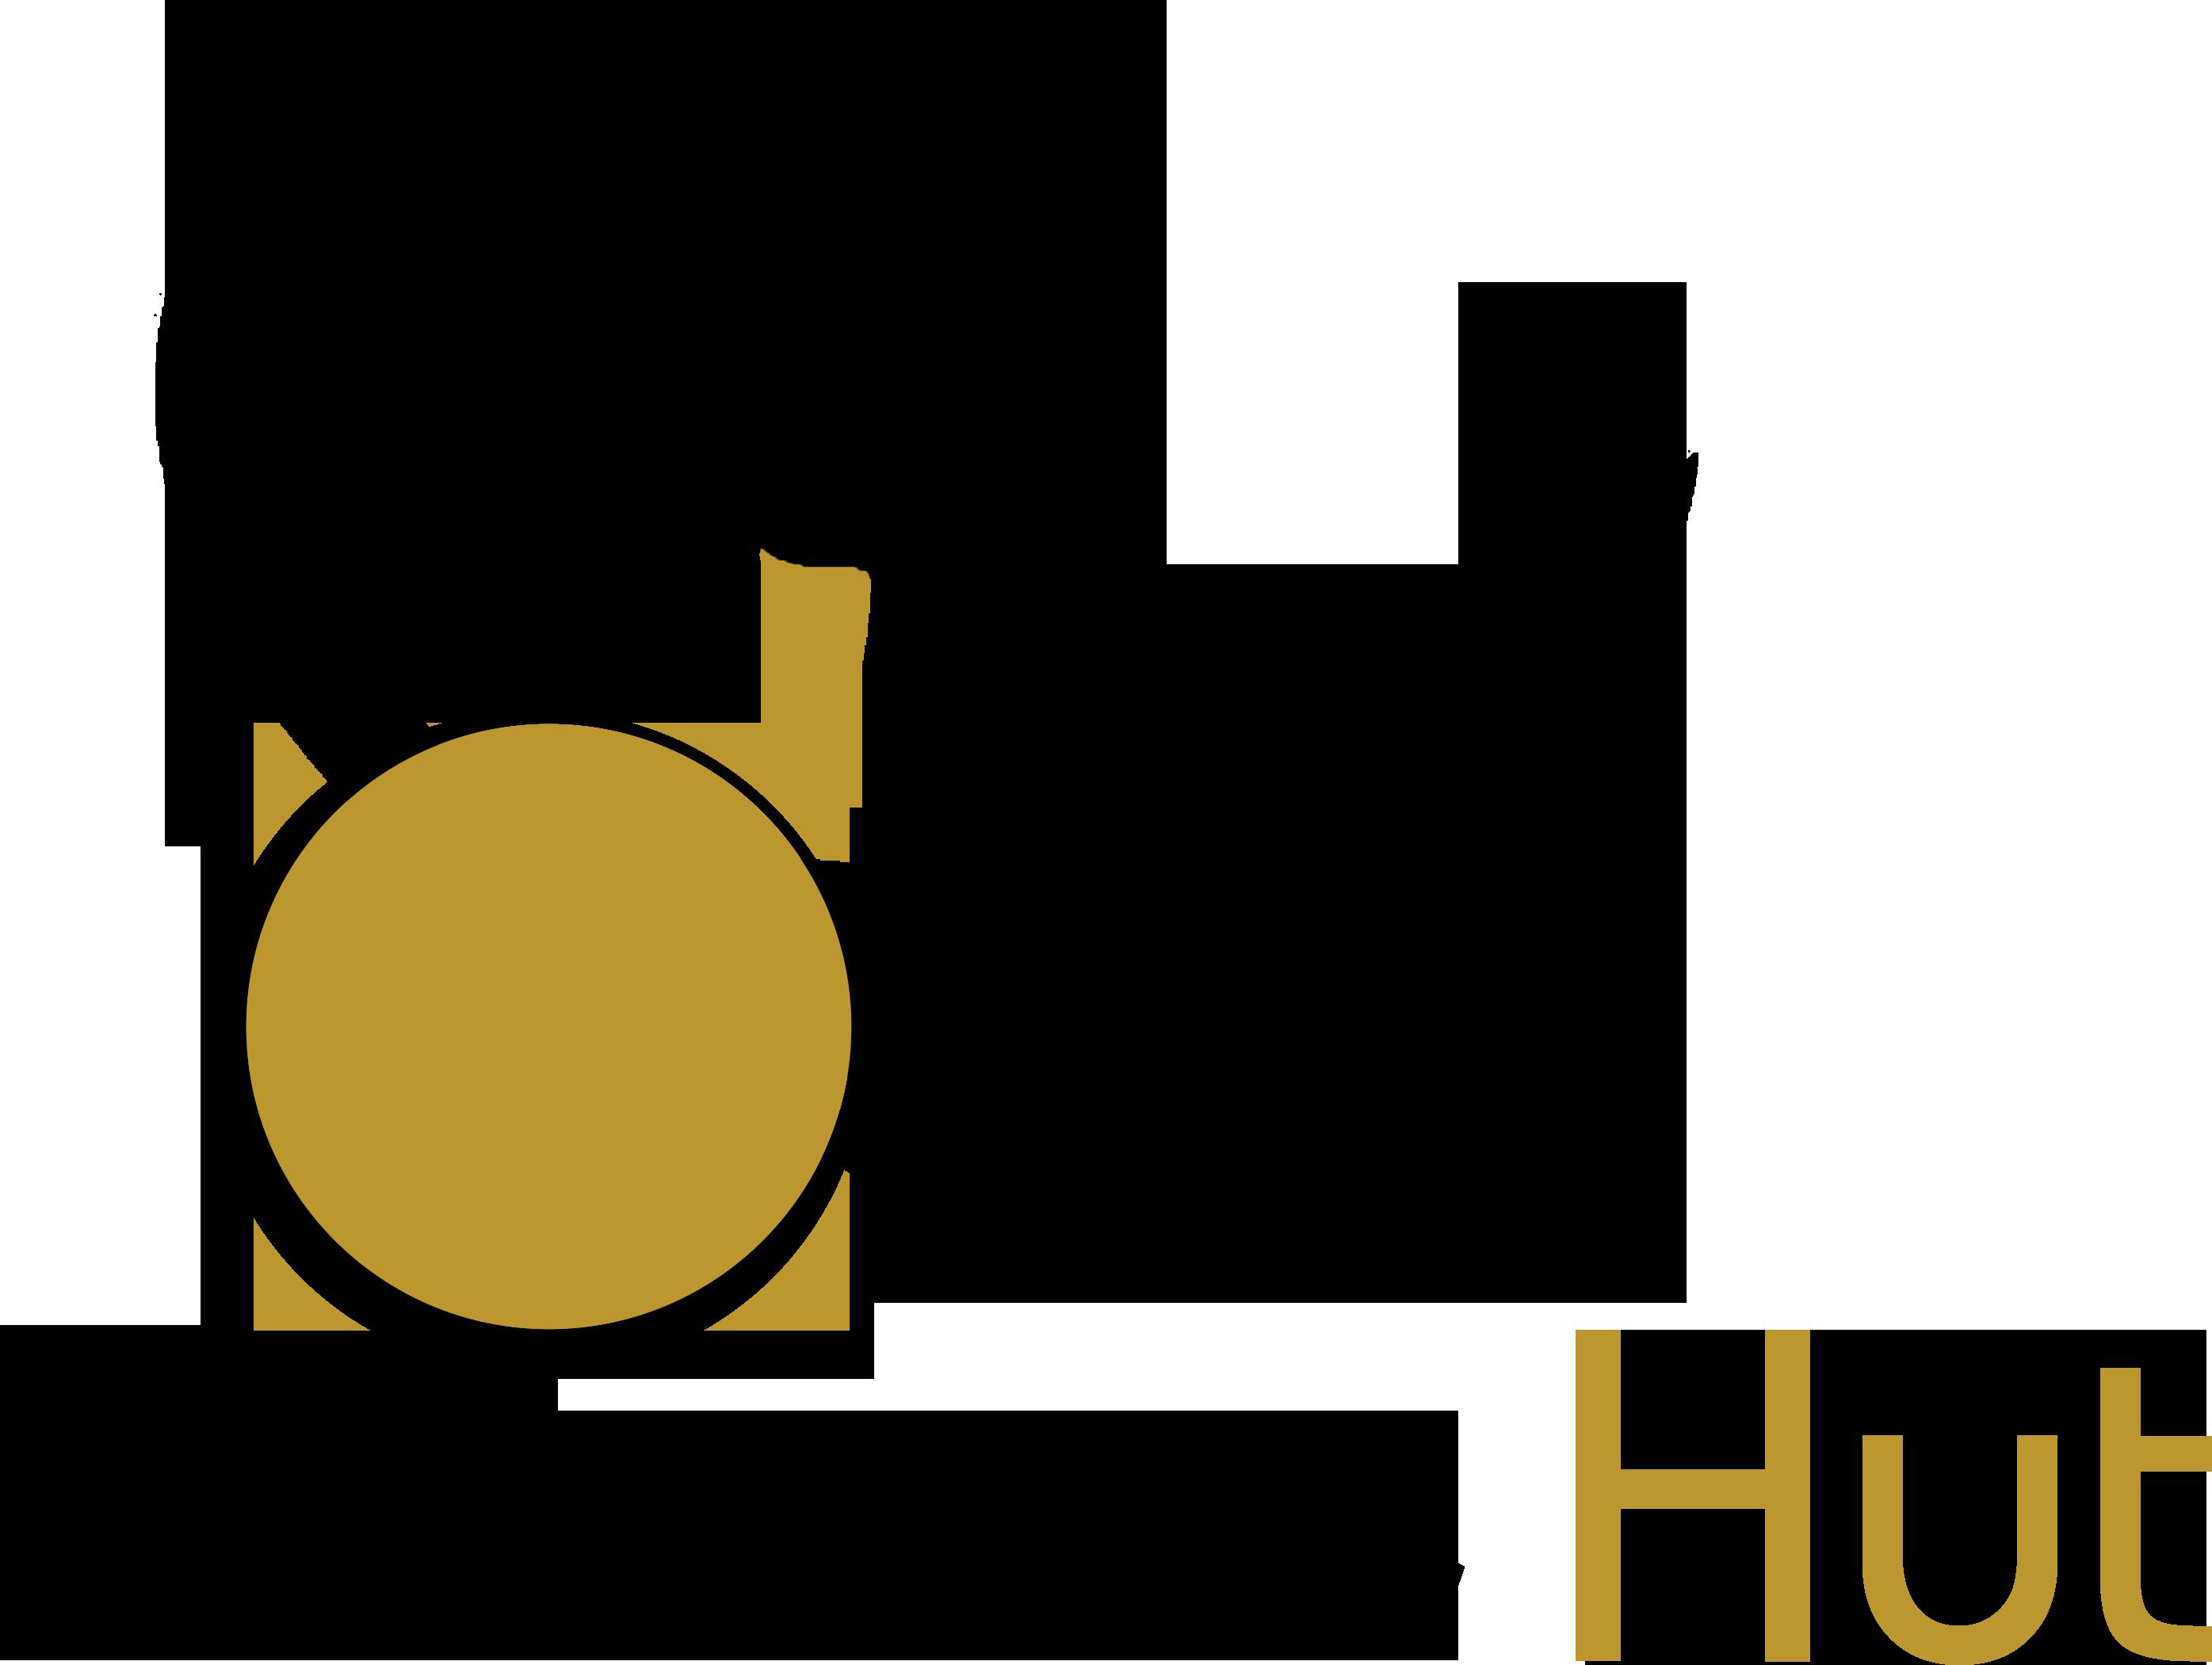 Finance Hut